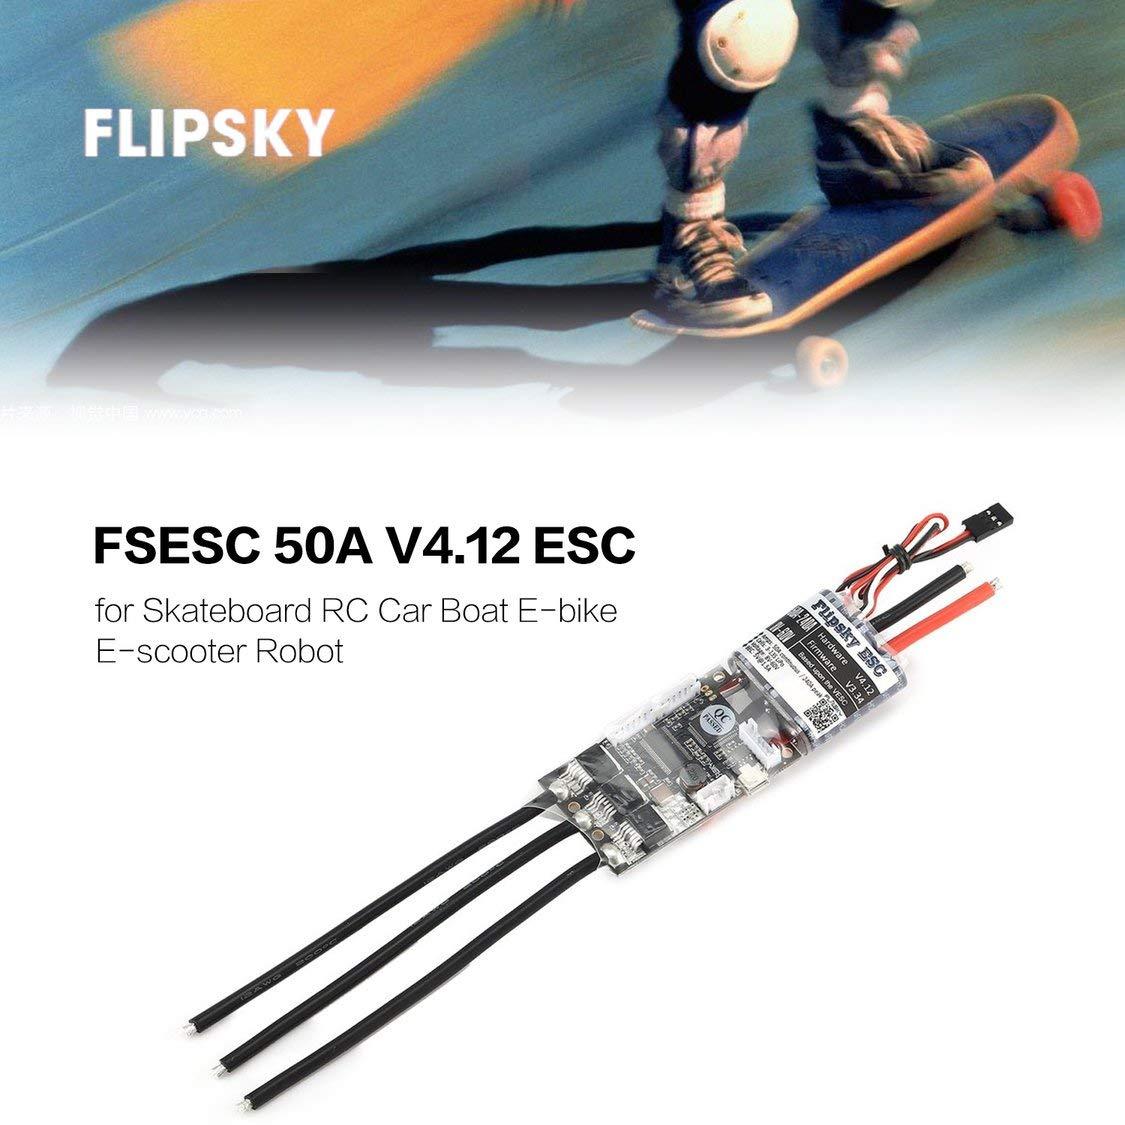 Fancysweety HGLRC FLIPSKY FSESC 50A V4.12 ESC Electronic Speed Control for Electric Skateboard RC Car Boat E-bike E-scooter Robot